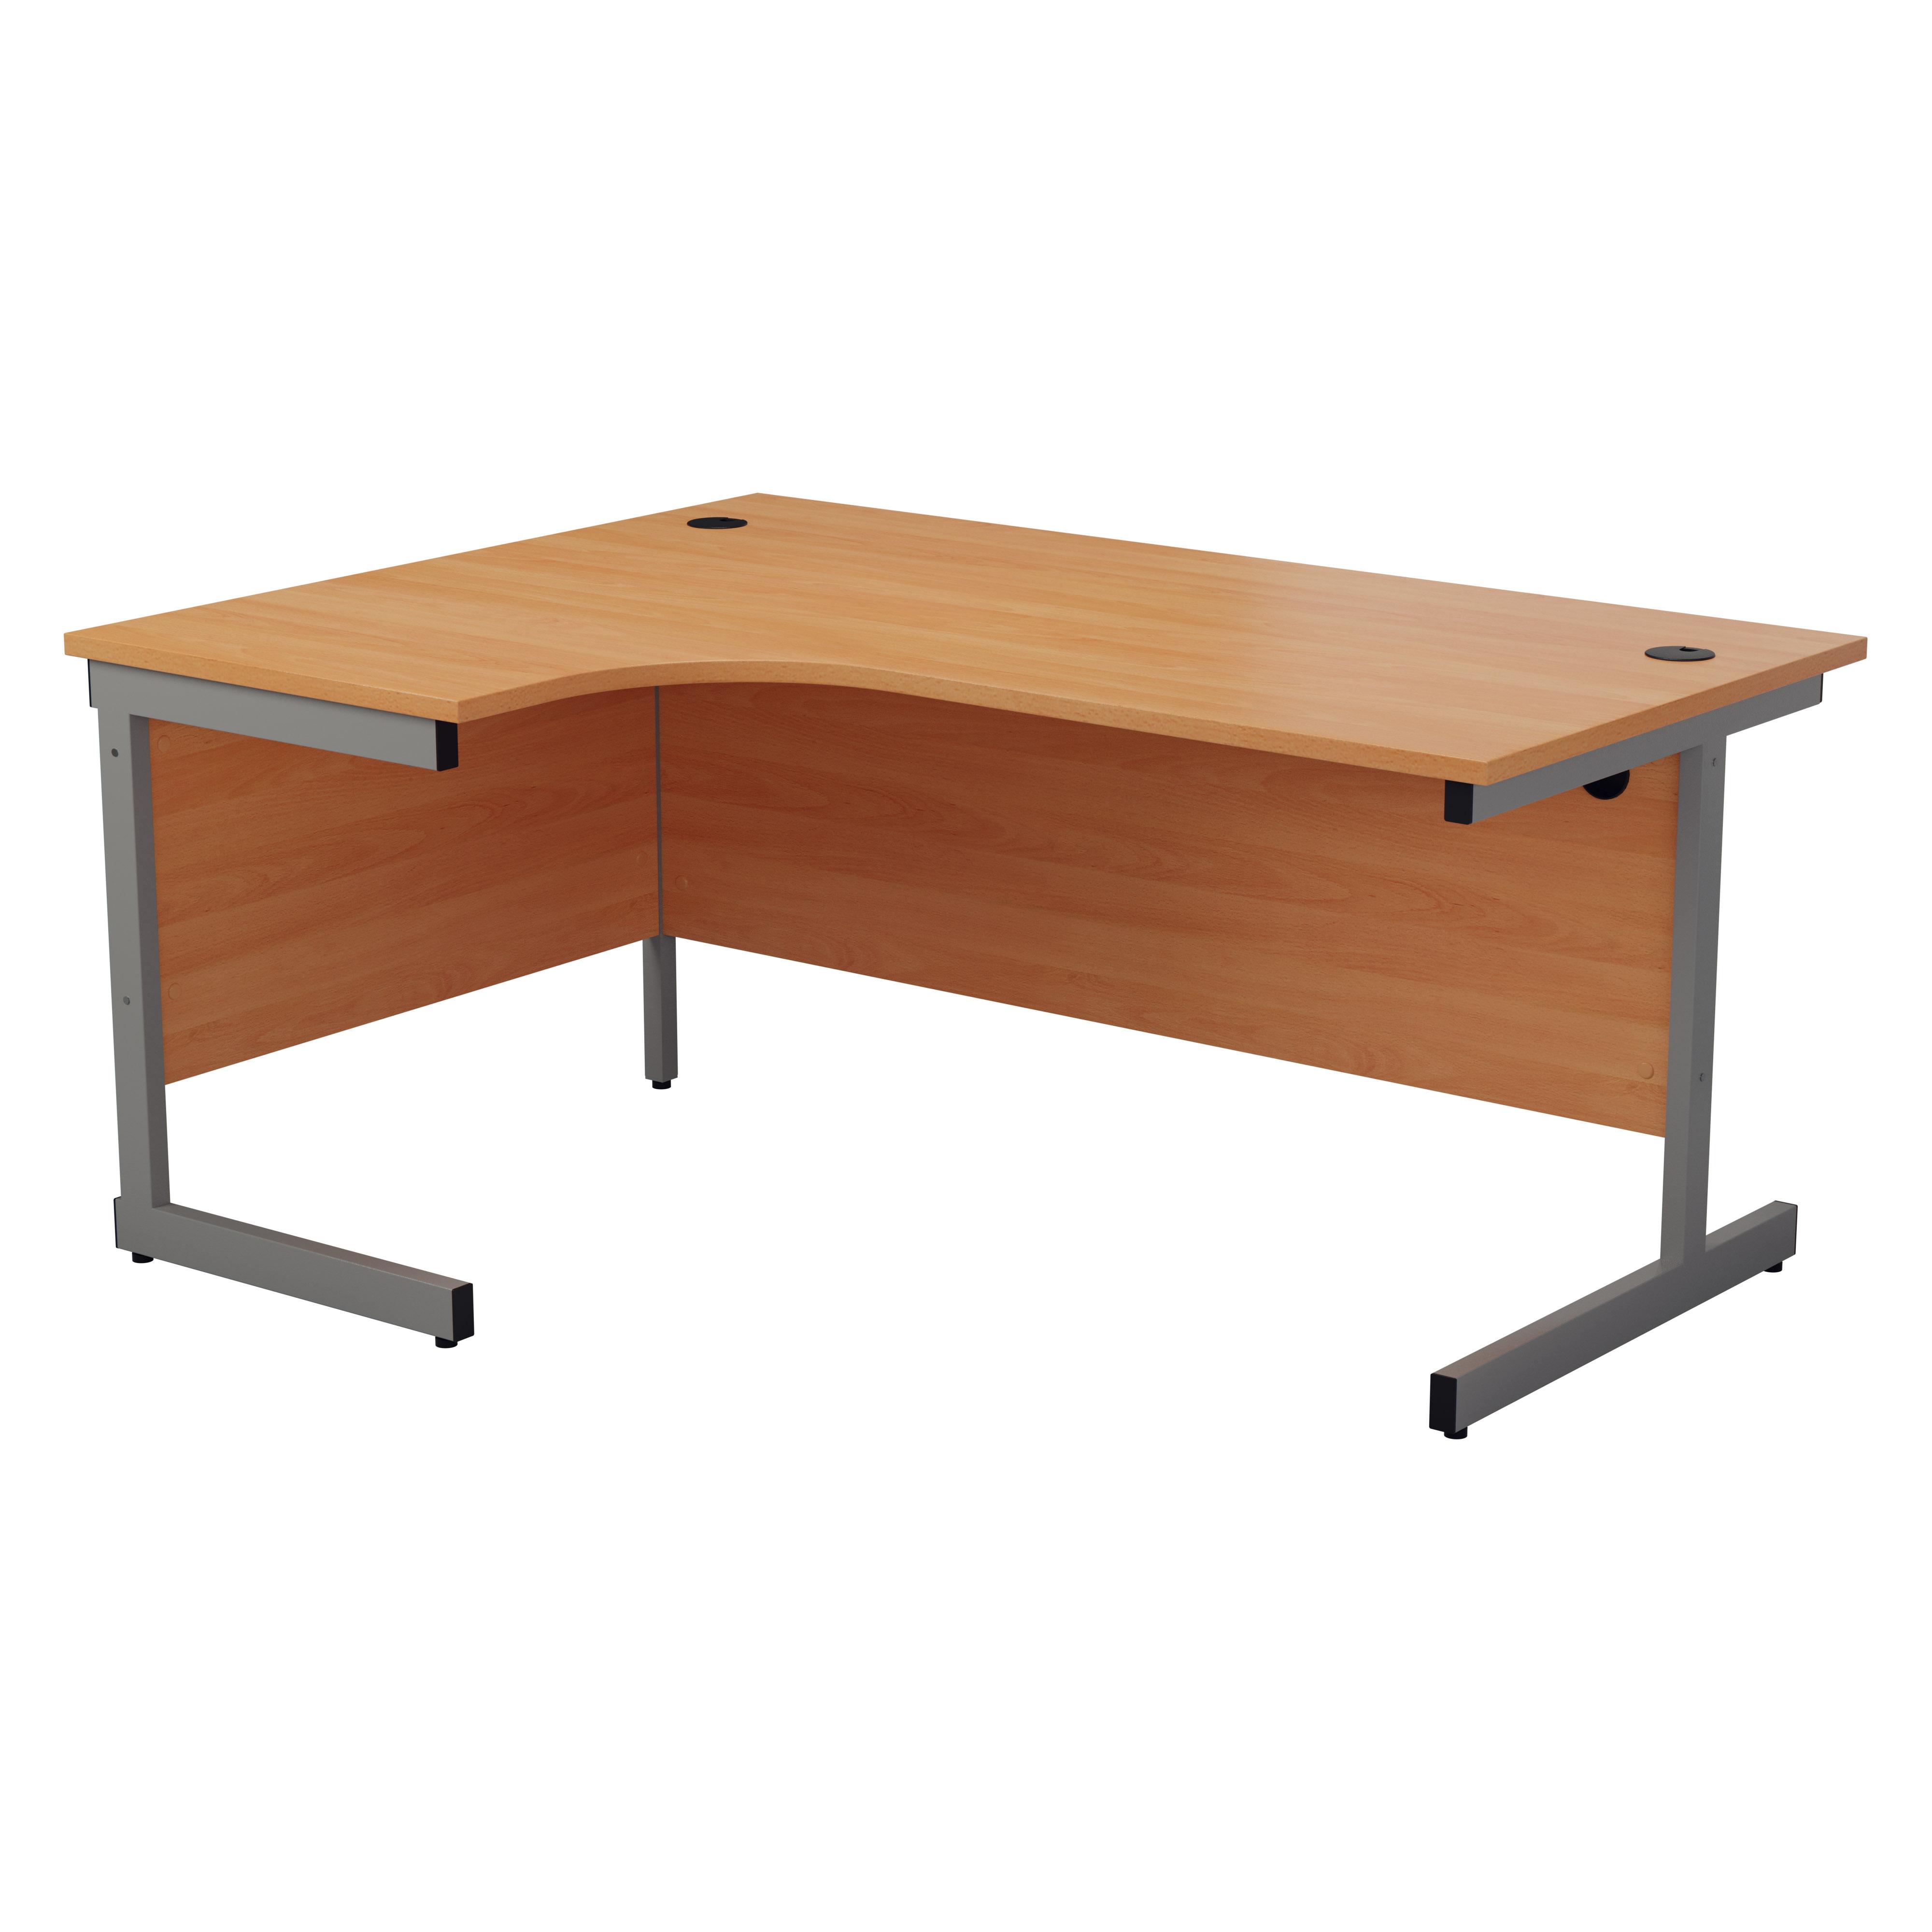 White Office Desk White 1600mm Left or Right Hand Crescent Desk and Pedestal